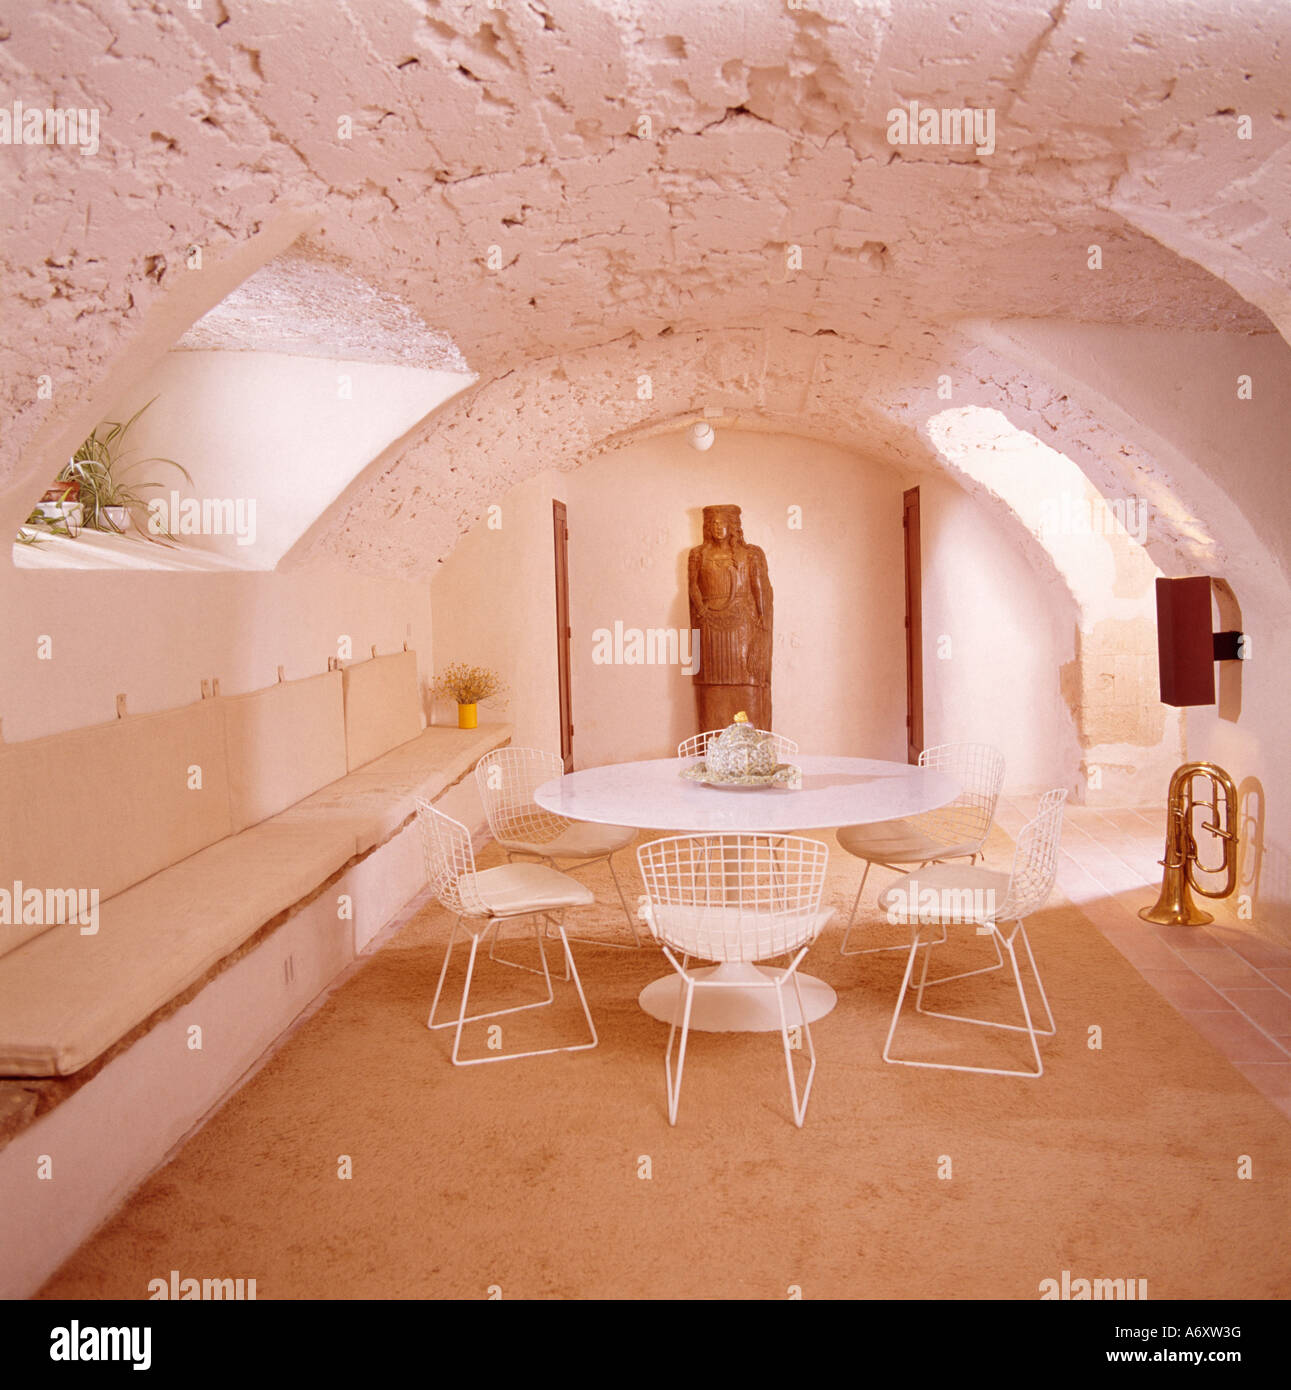 Enjoyable Banquette Seating Below Window In Basement Diningroom With Spiritservingveterans Wood Chair Design Ideas Spiritservingveteransorg